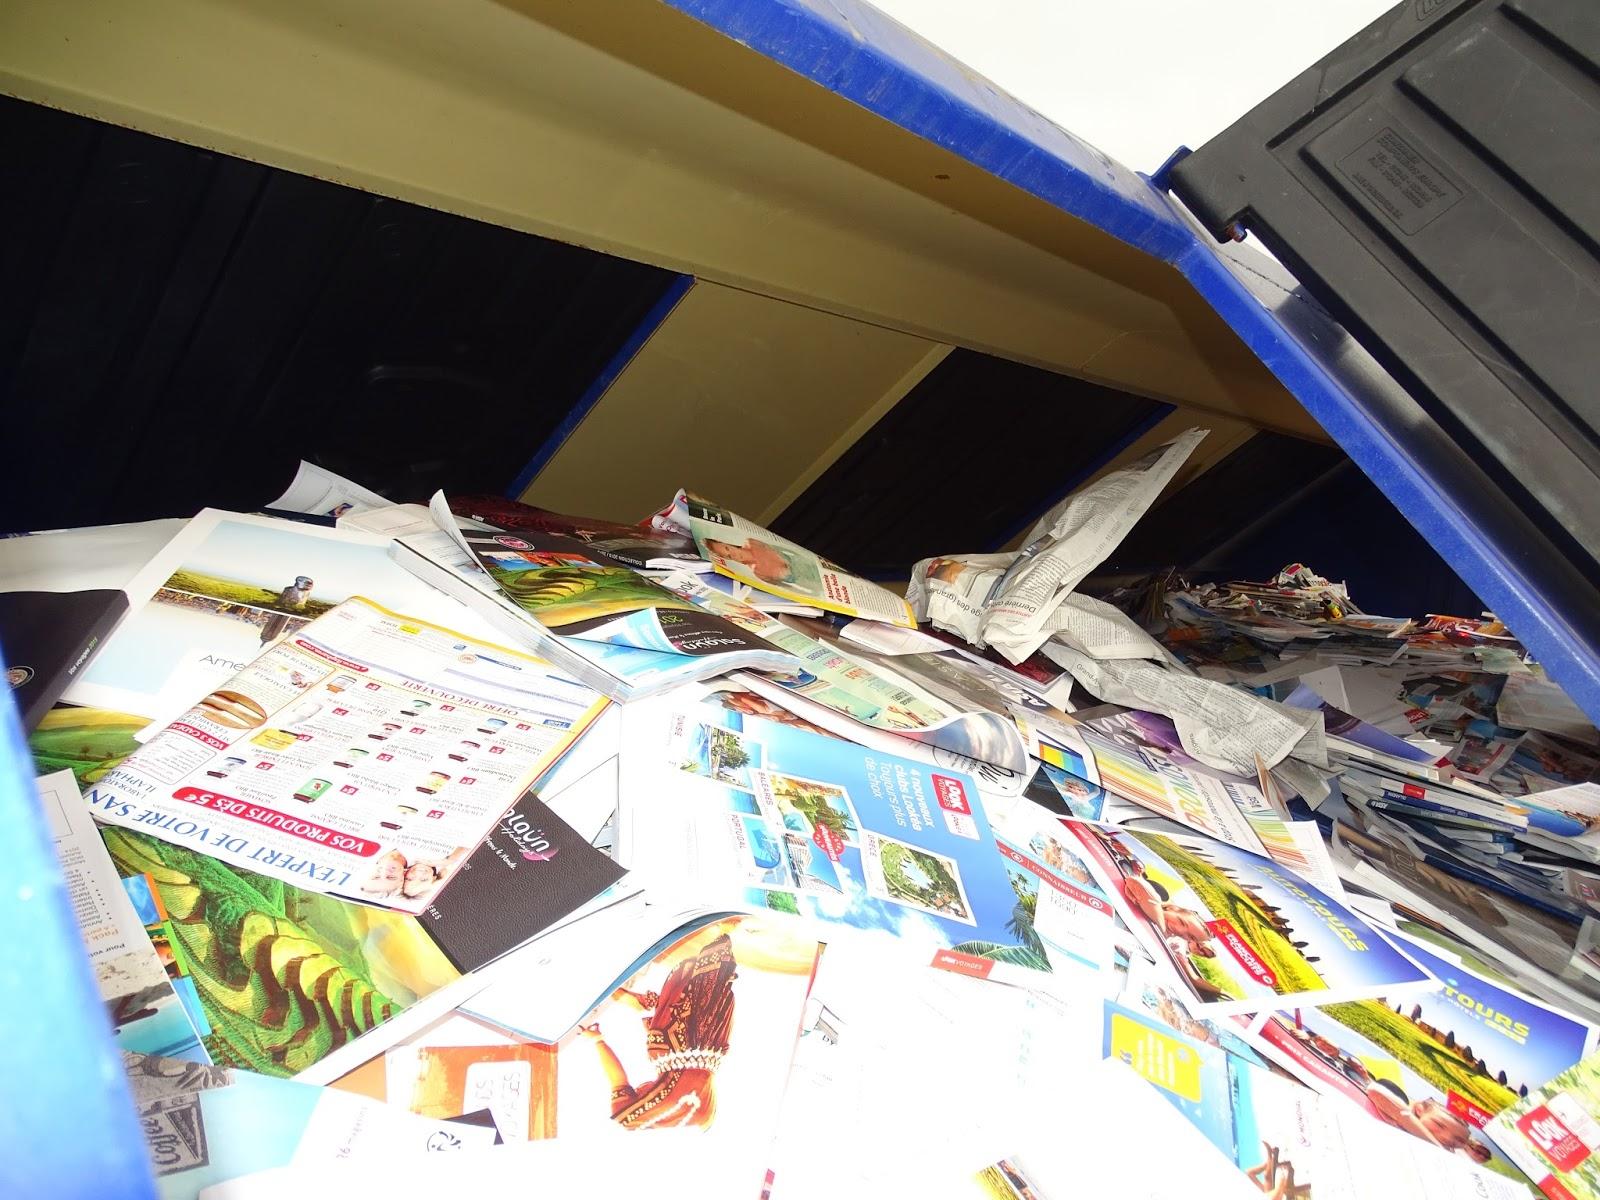 ape bellebranche ecouflant bennes papier. Black Bedroom Furniture Sets. Home Design Ideas